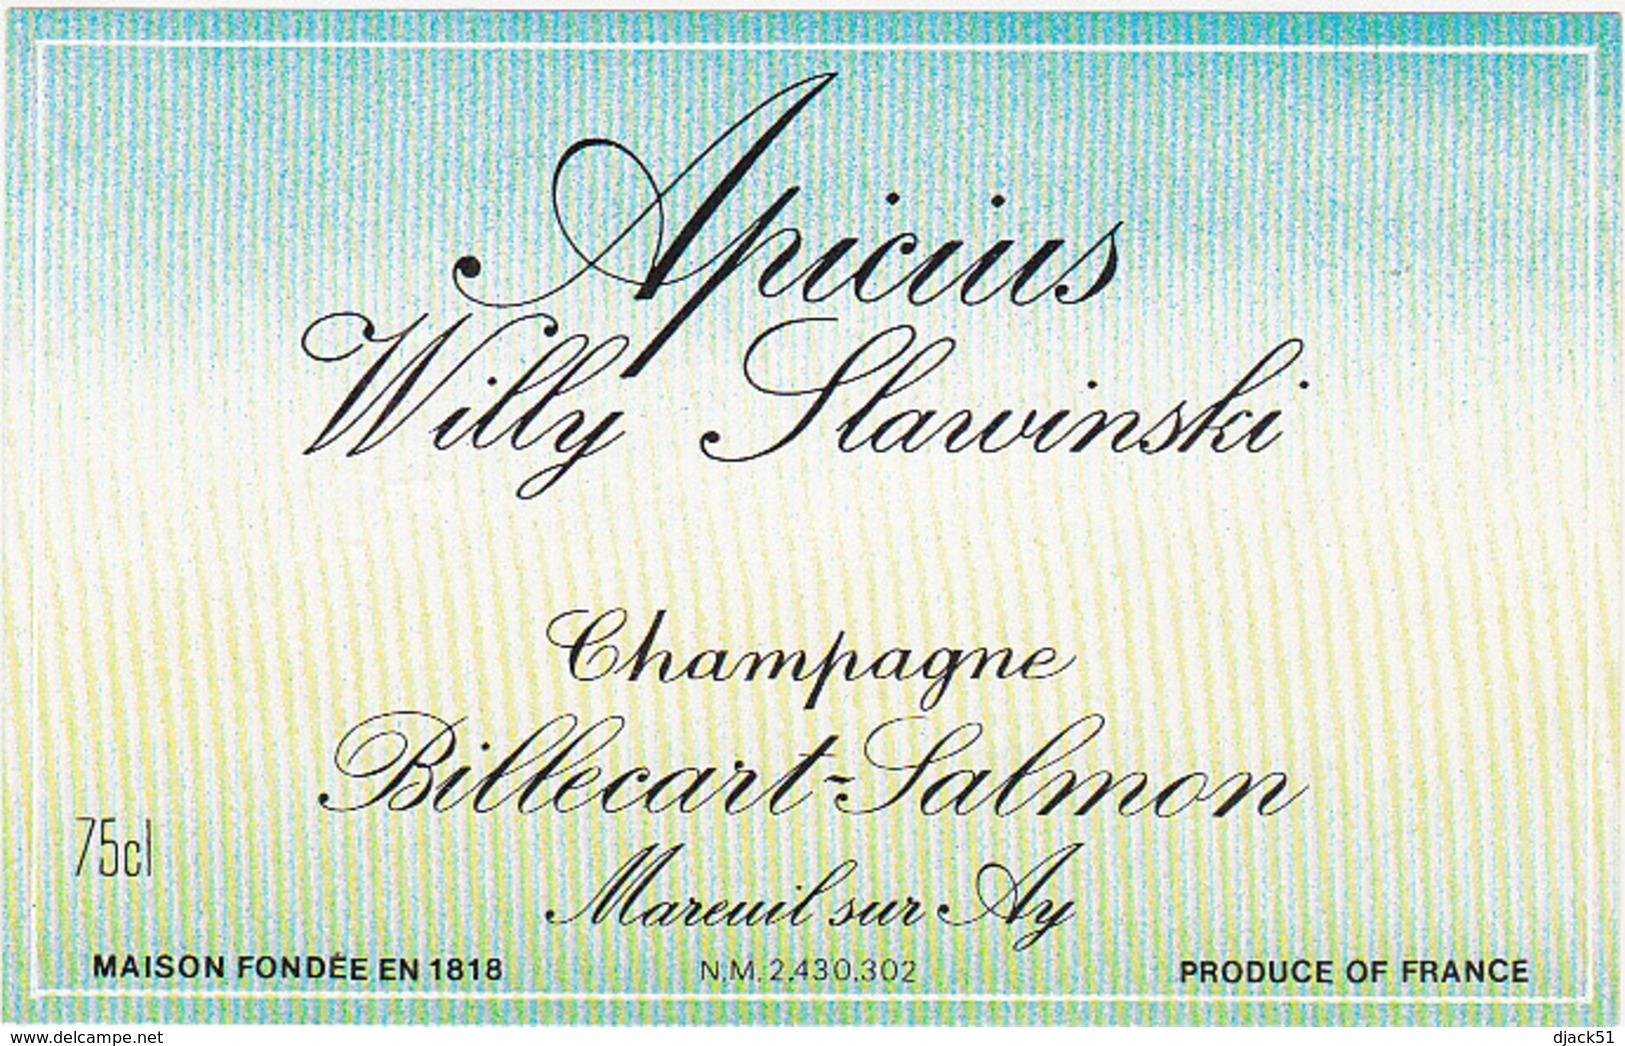 Etiquette Champagne Apicius Willy Slawinski - Billecart-Salmon à Mareuil-sur-Ay (51) / 75 Cl - Champagne